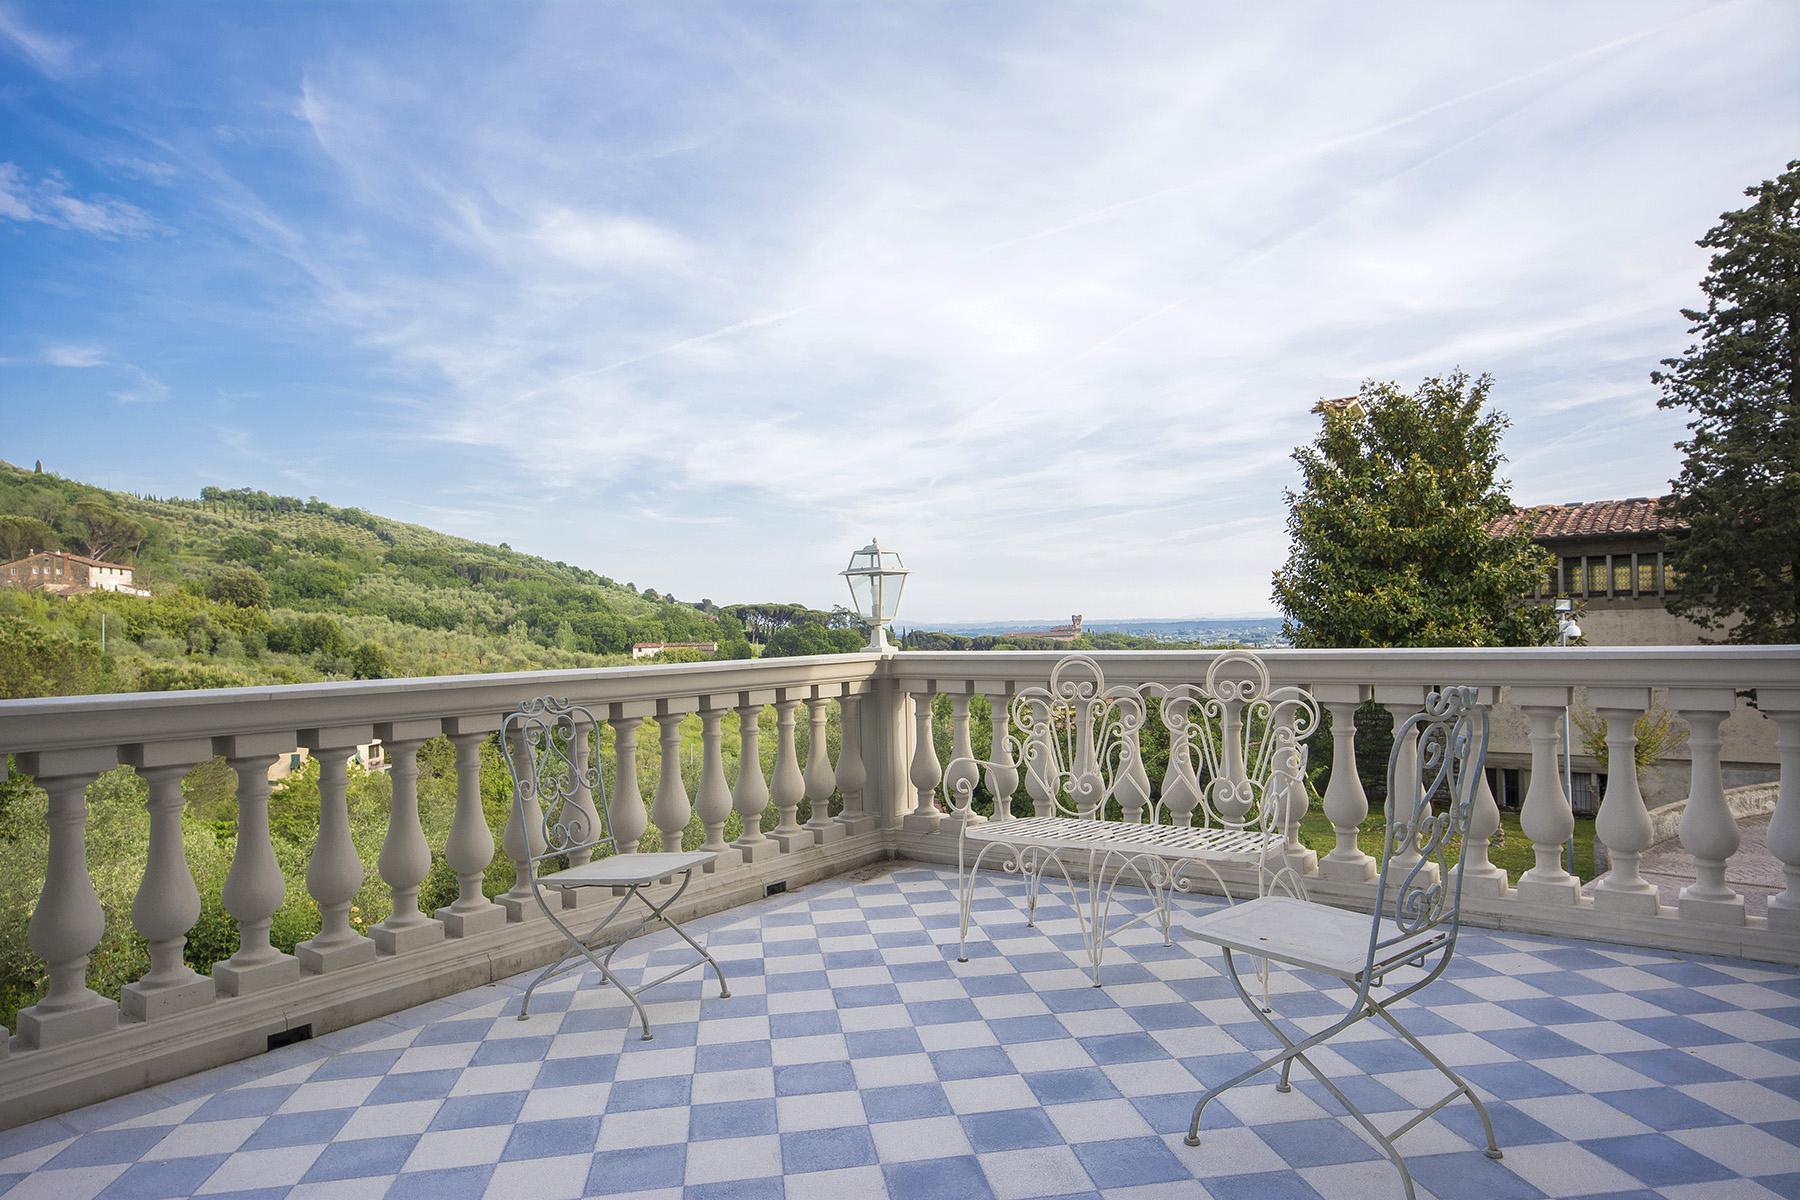 Montecatini Terme小镇优雅的新艺术风格的别墅 - 34